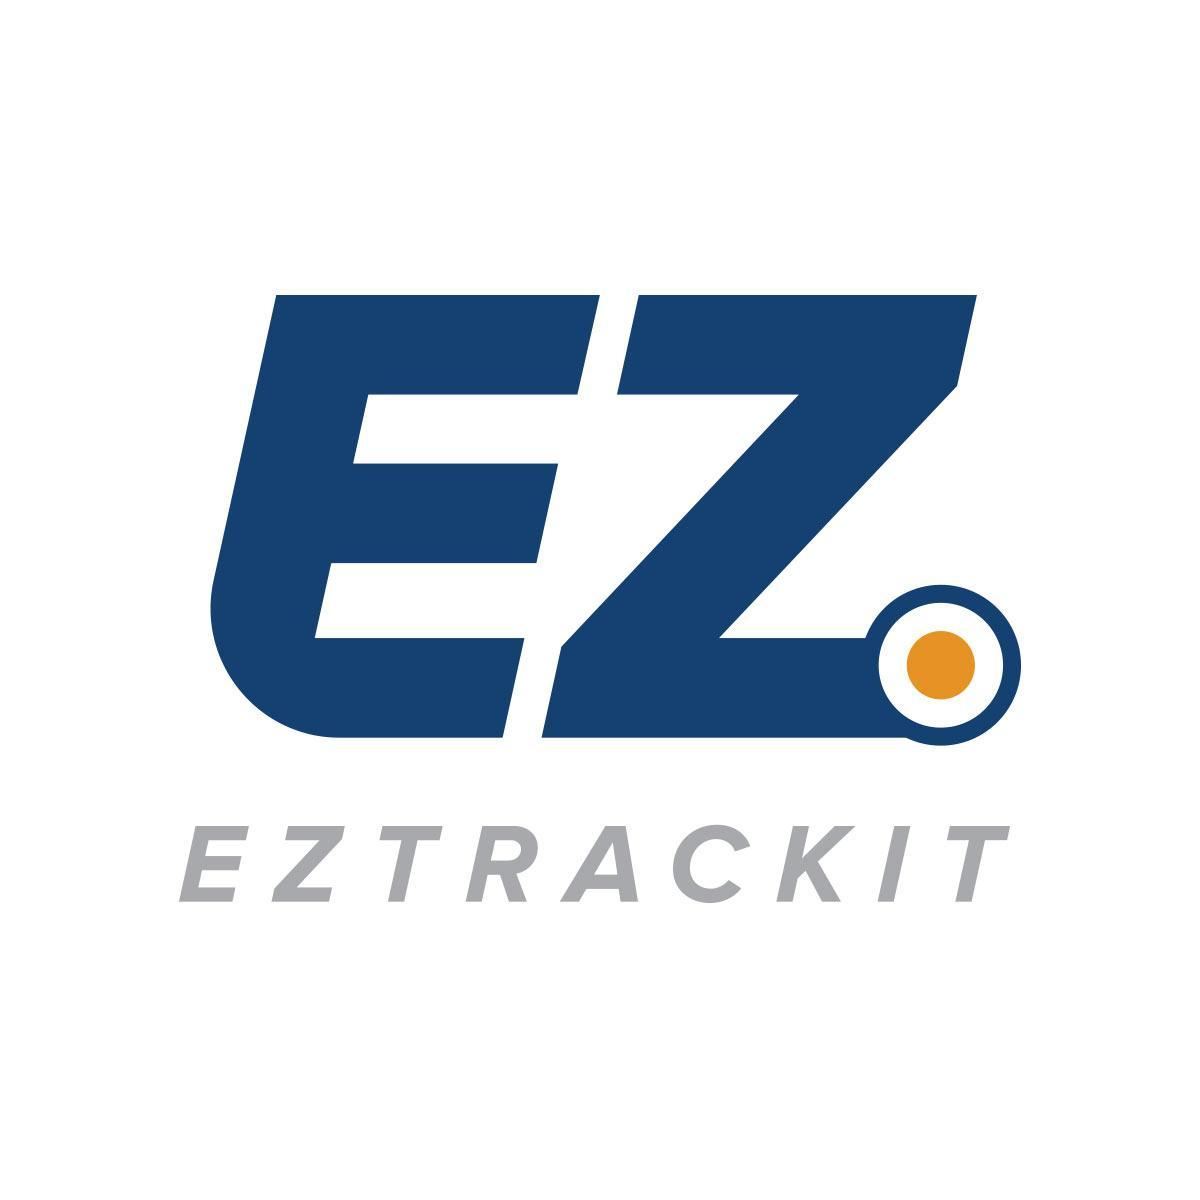 EZTrackIt